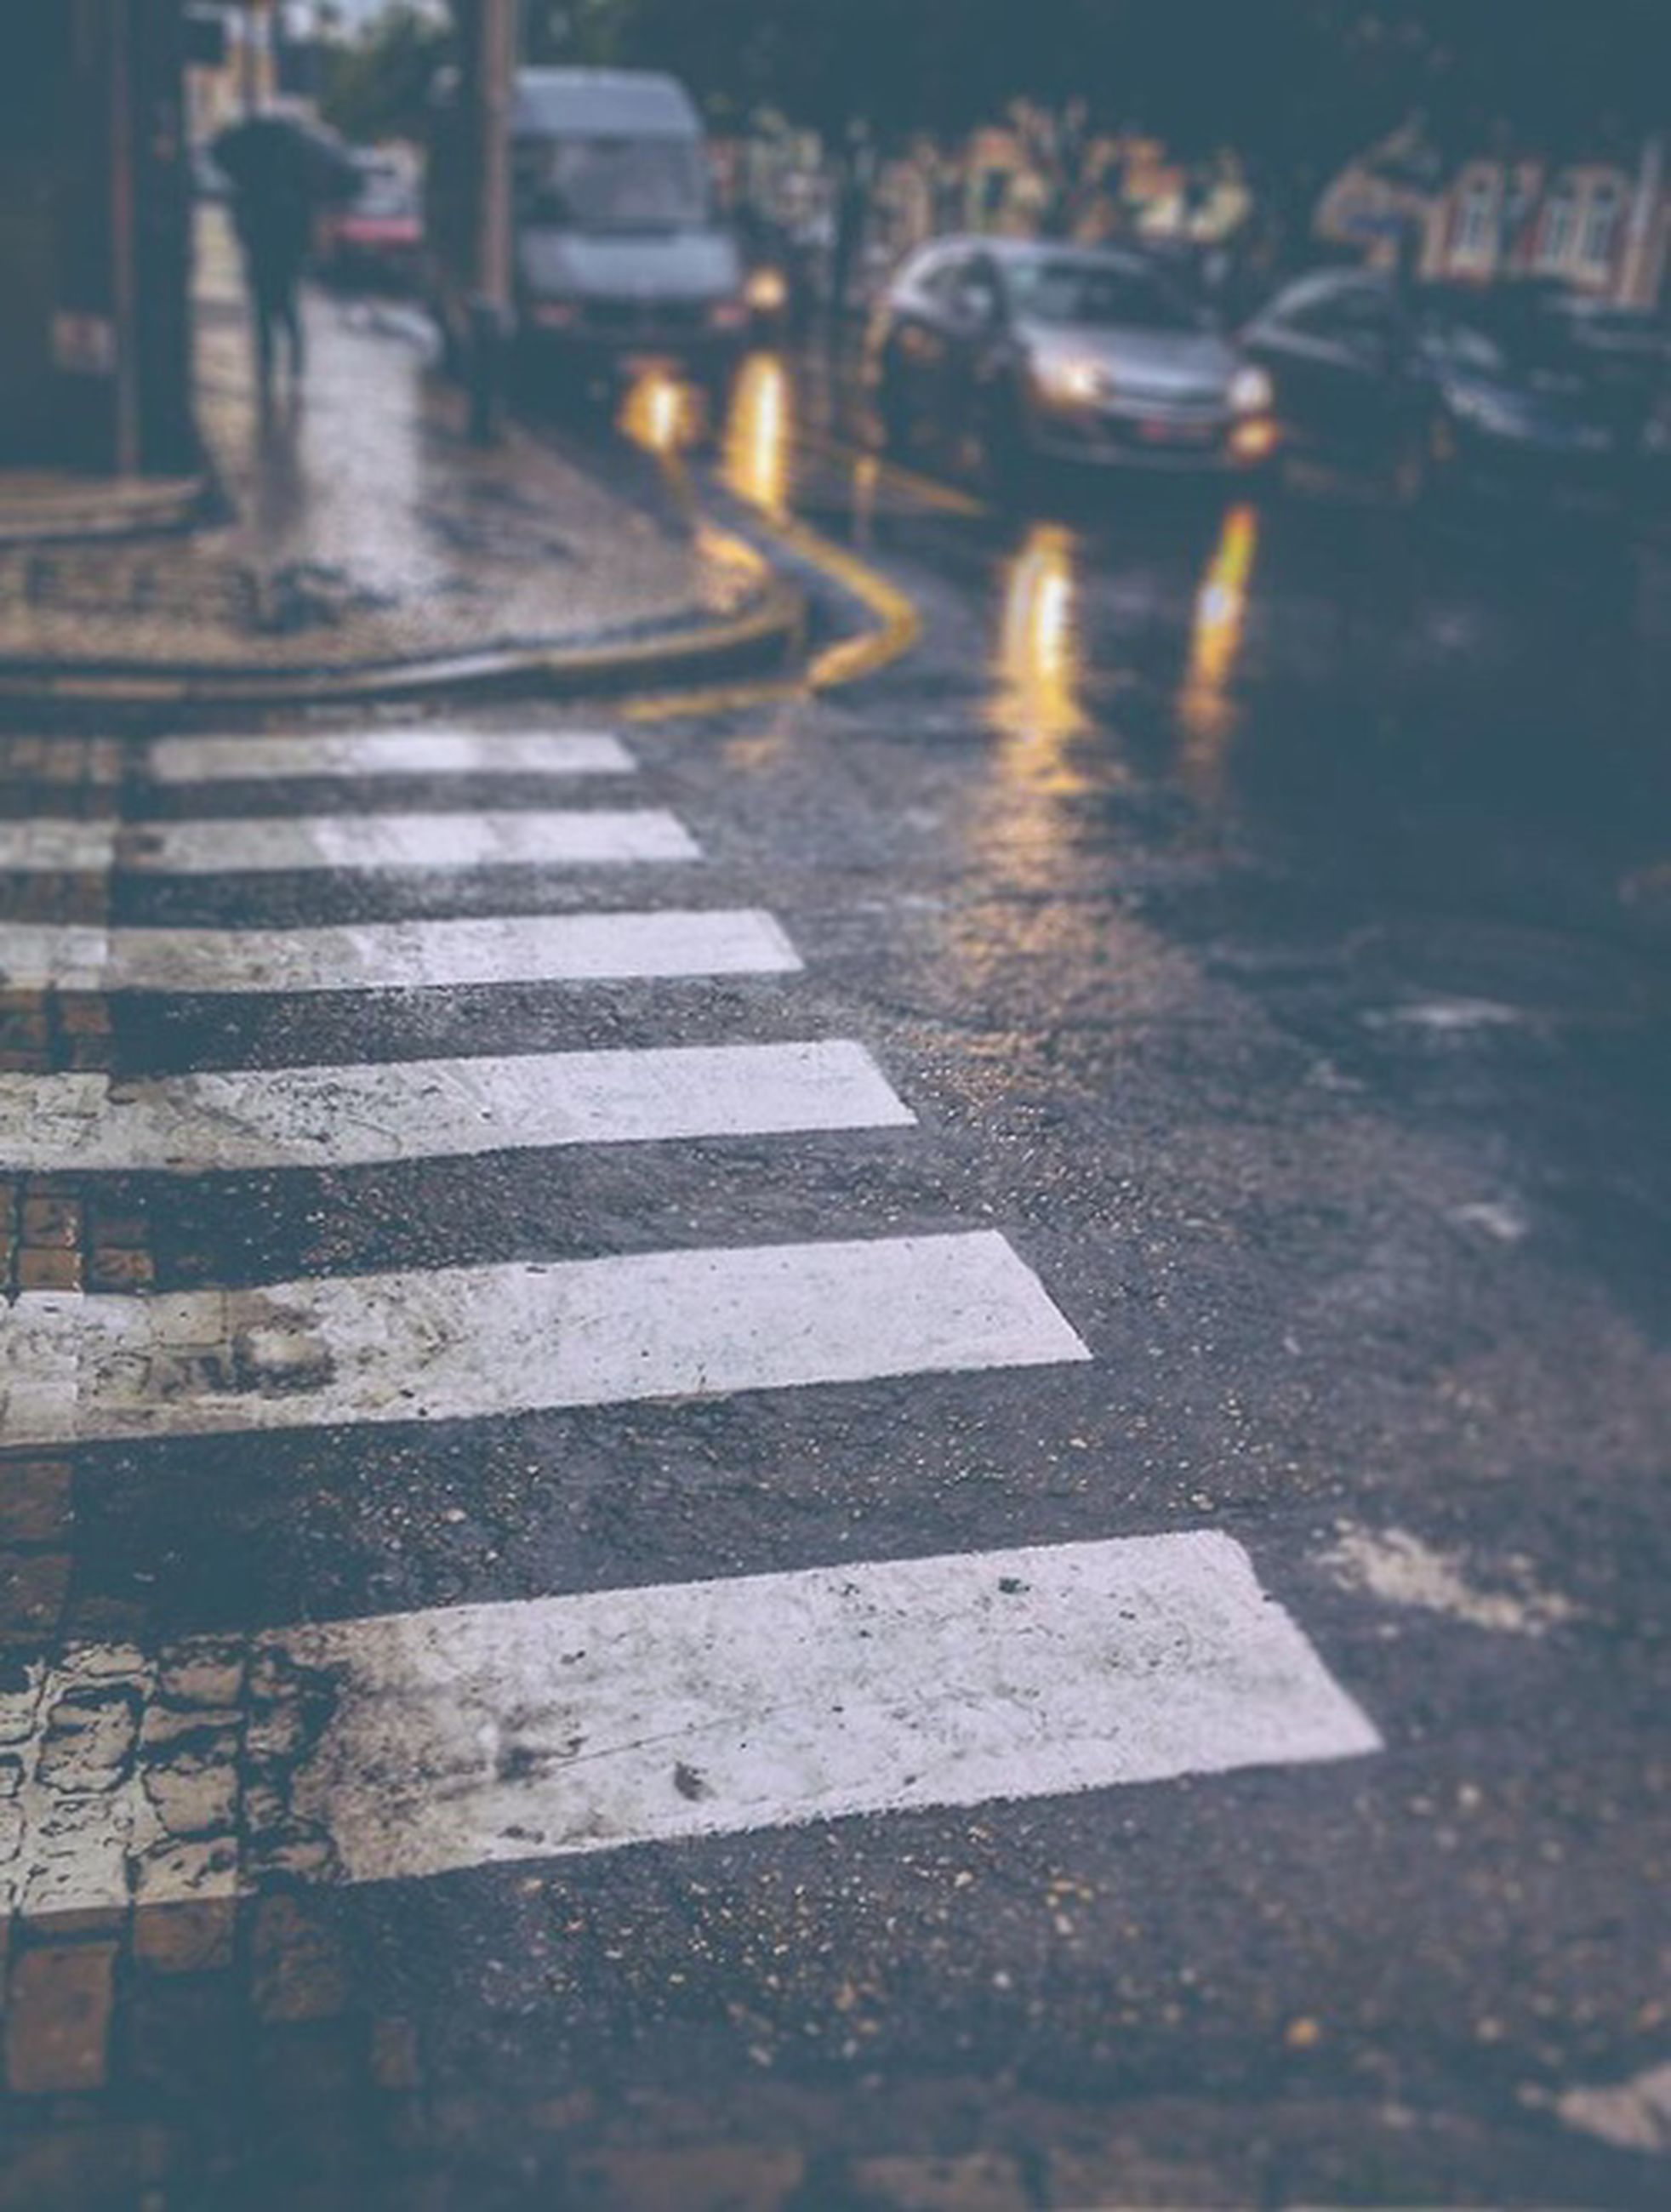 street, road marking, transportation, road, zebra crossing, asphalt, city, car, the way forward, city street, sidewalk, high angle view, sunlight, shadow, incidental people, outdoors, building exterior, city life, land vehicle, day